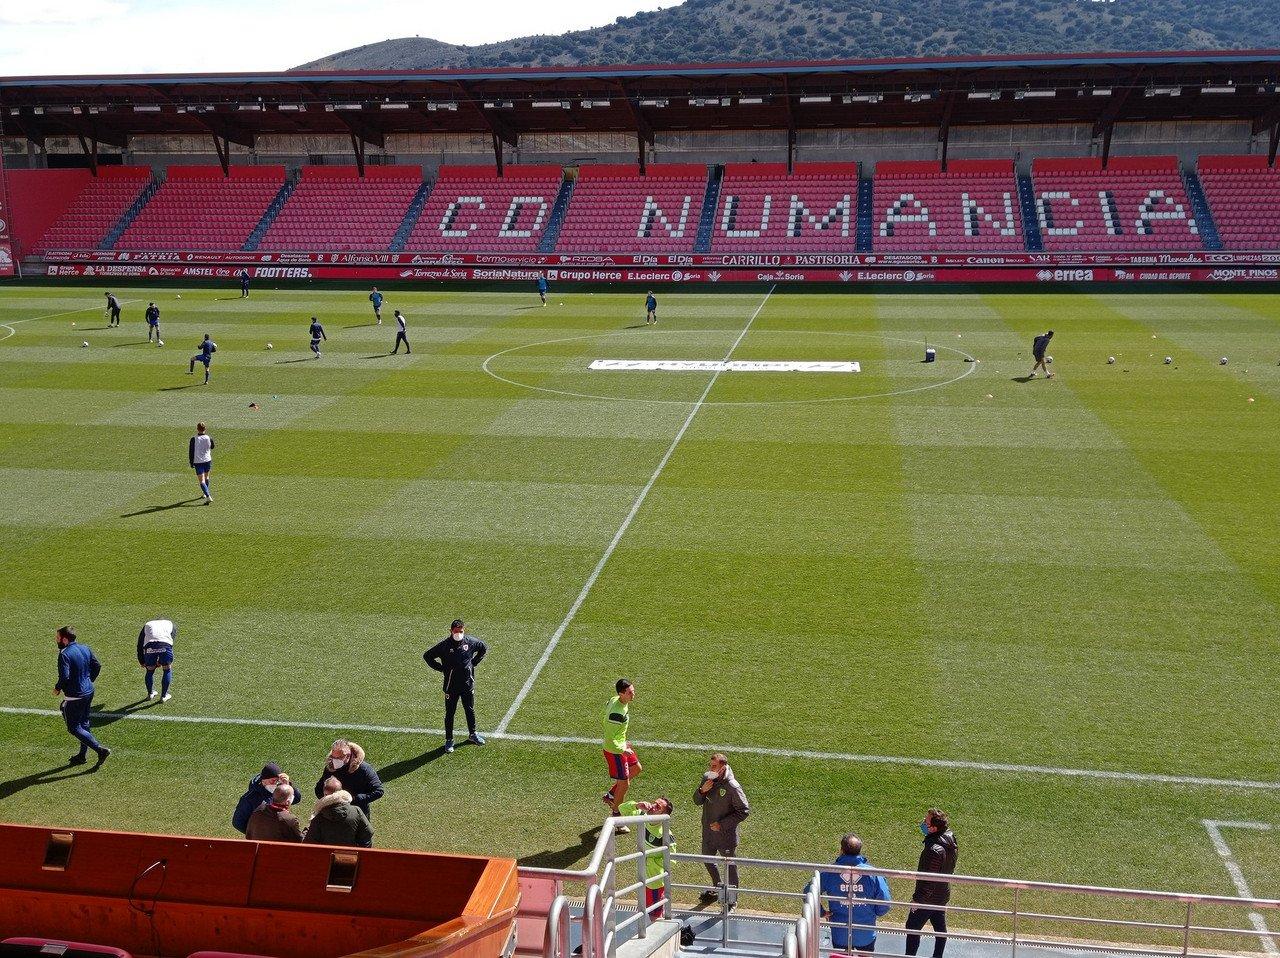 El CD Numancia golea a un triste Covadonga